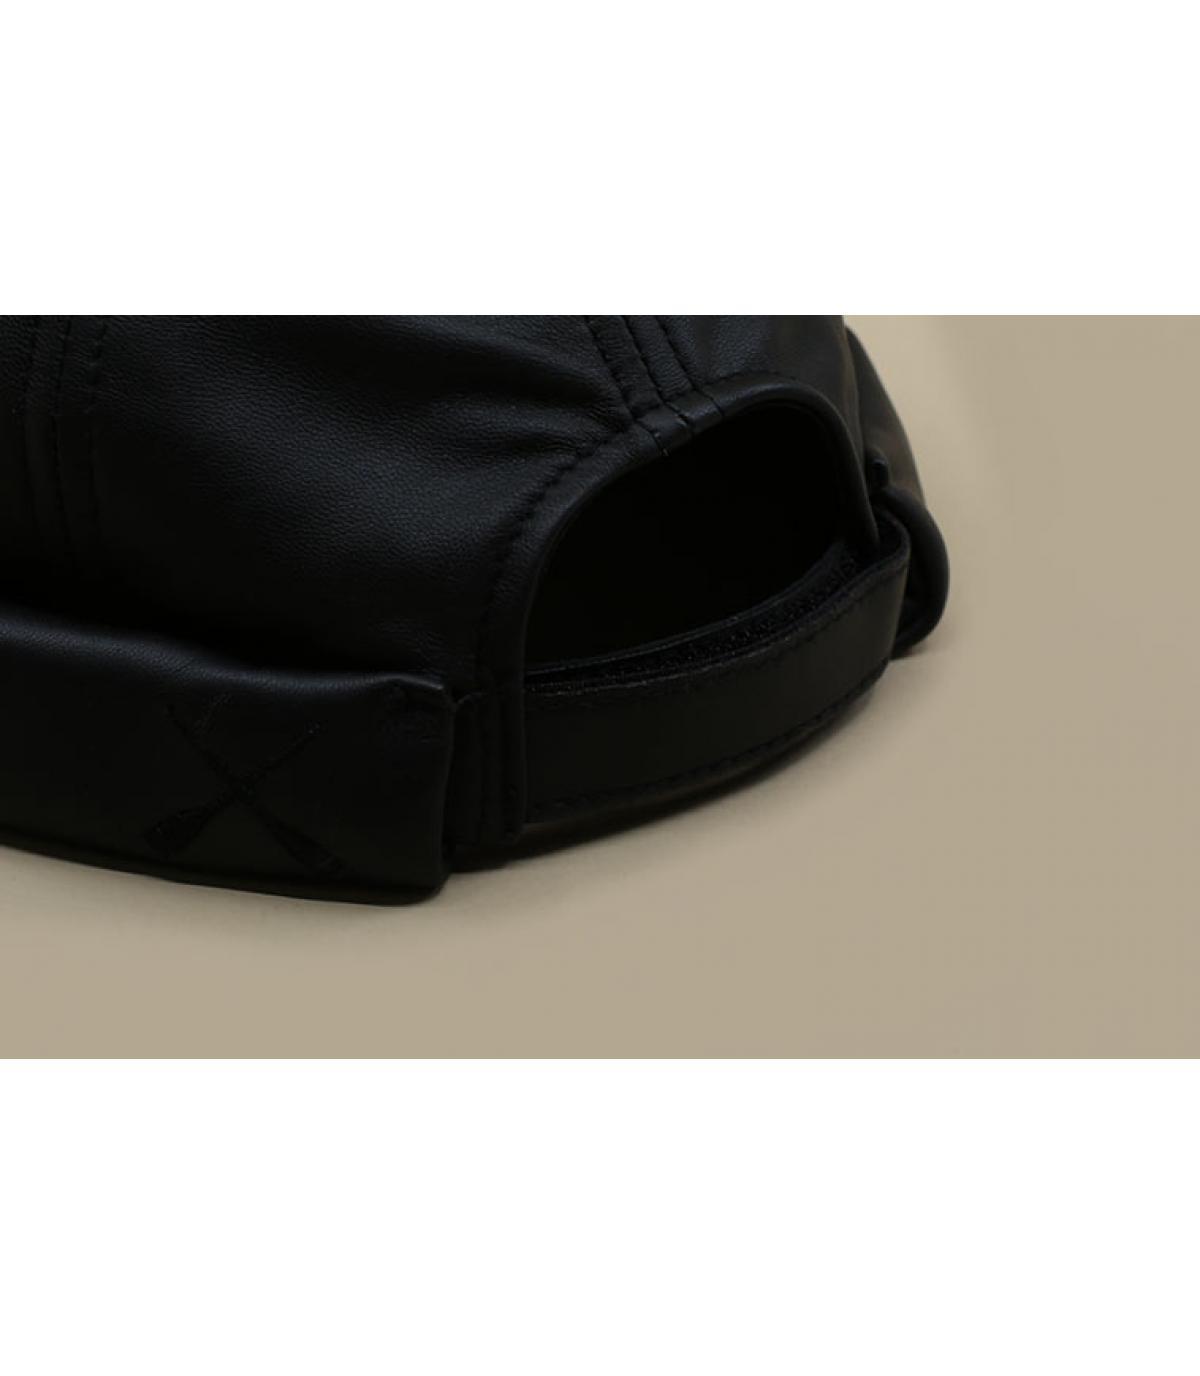 Detalles Miki Leather Waxy black imagen 3